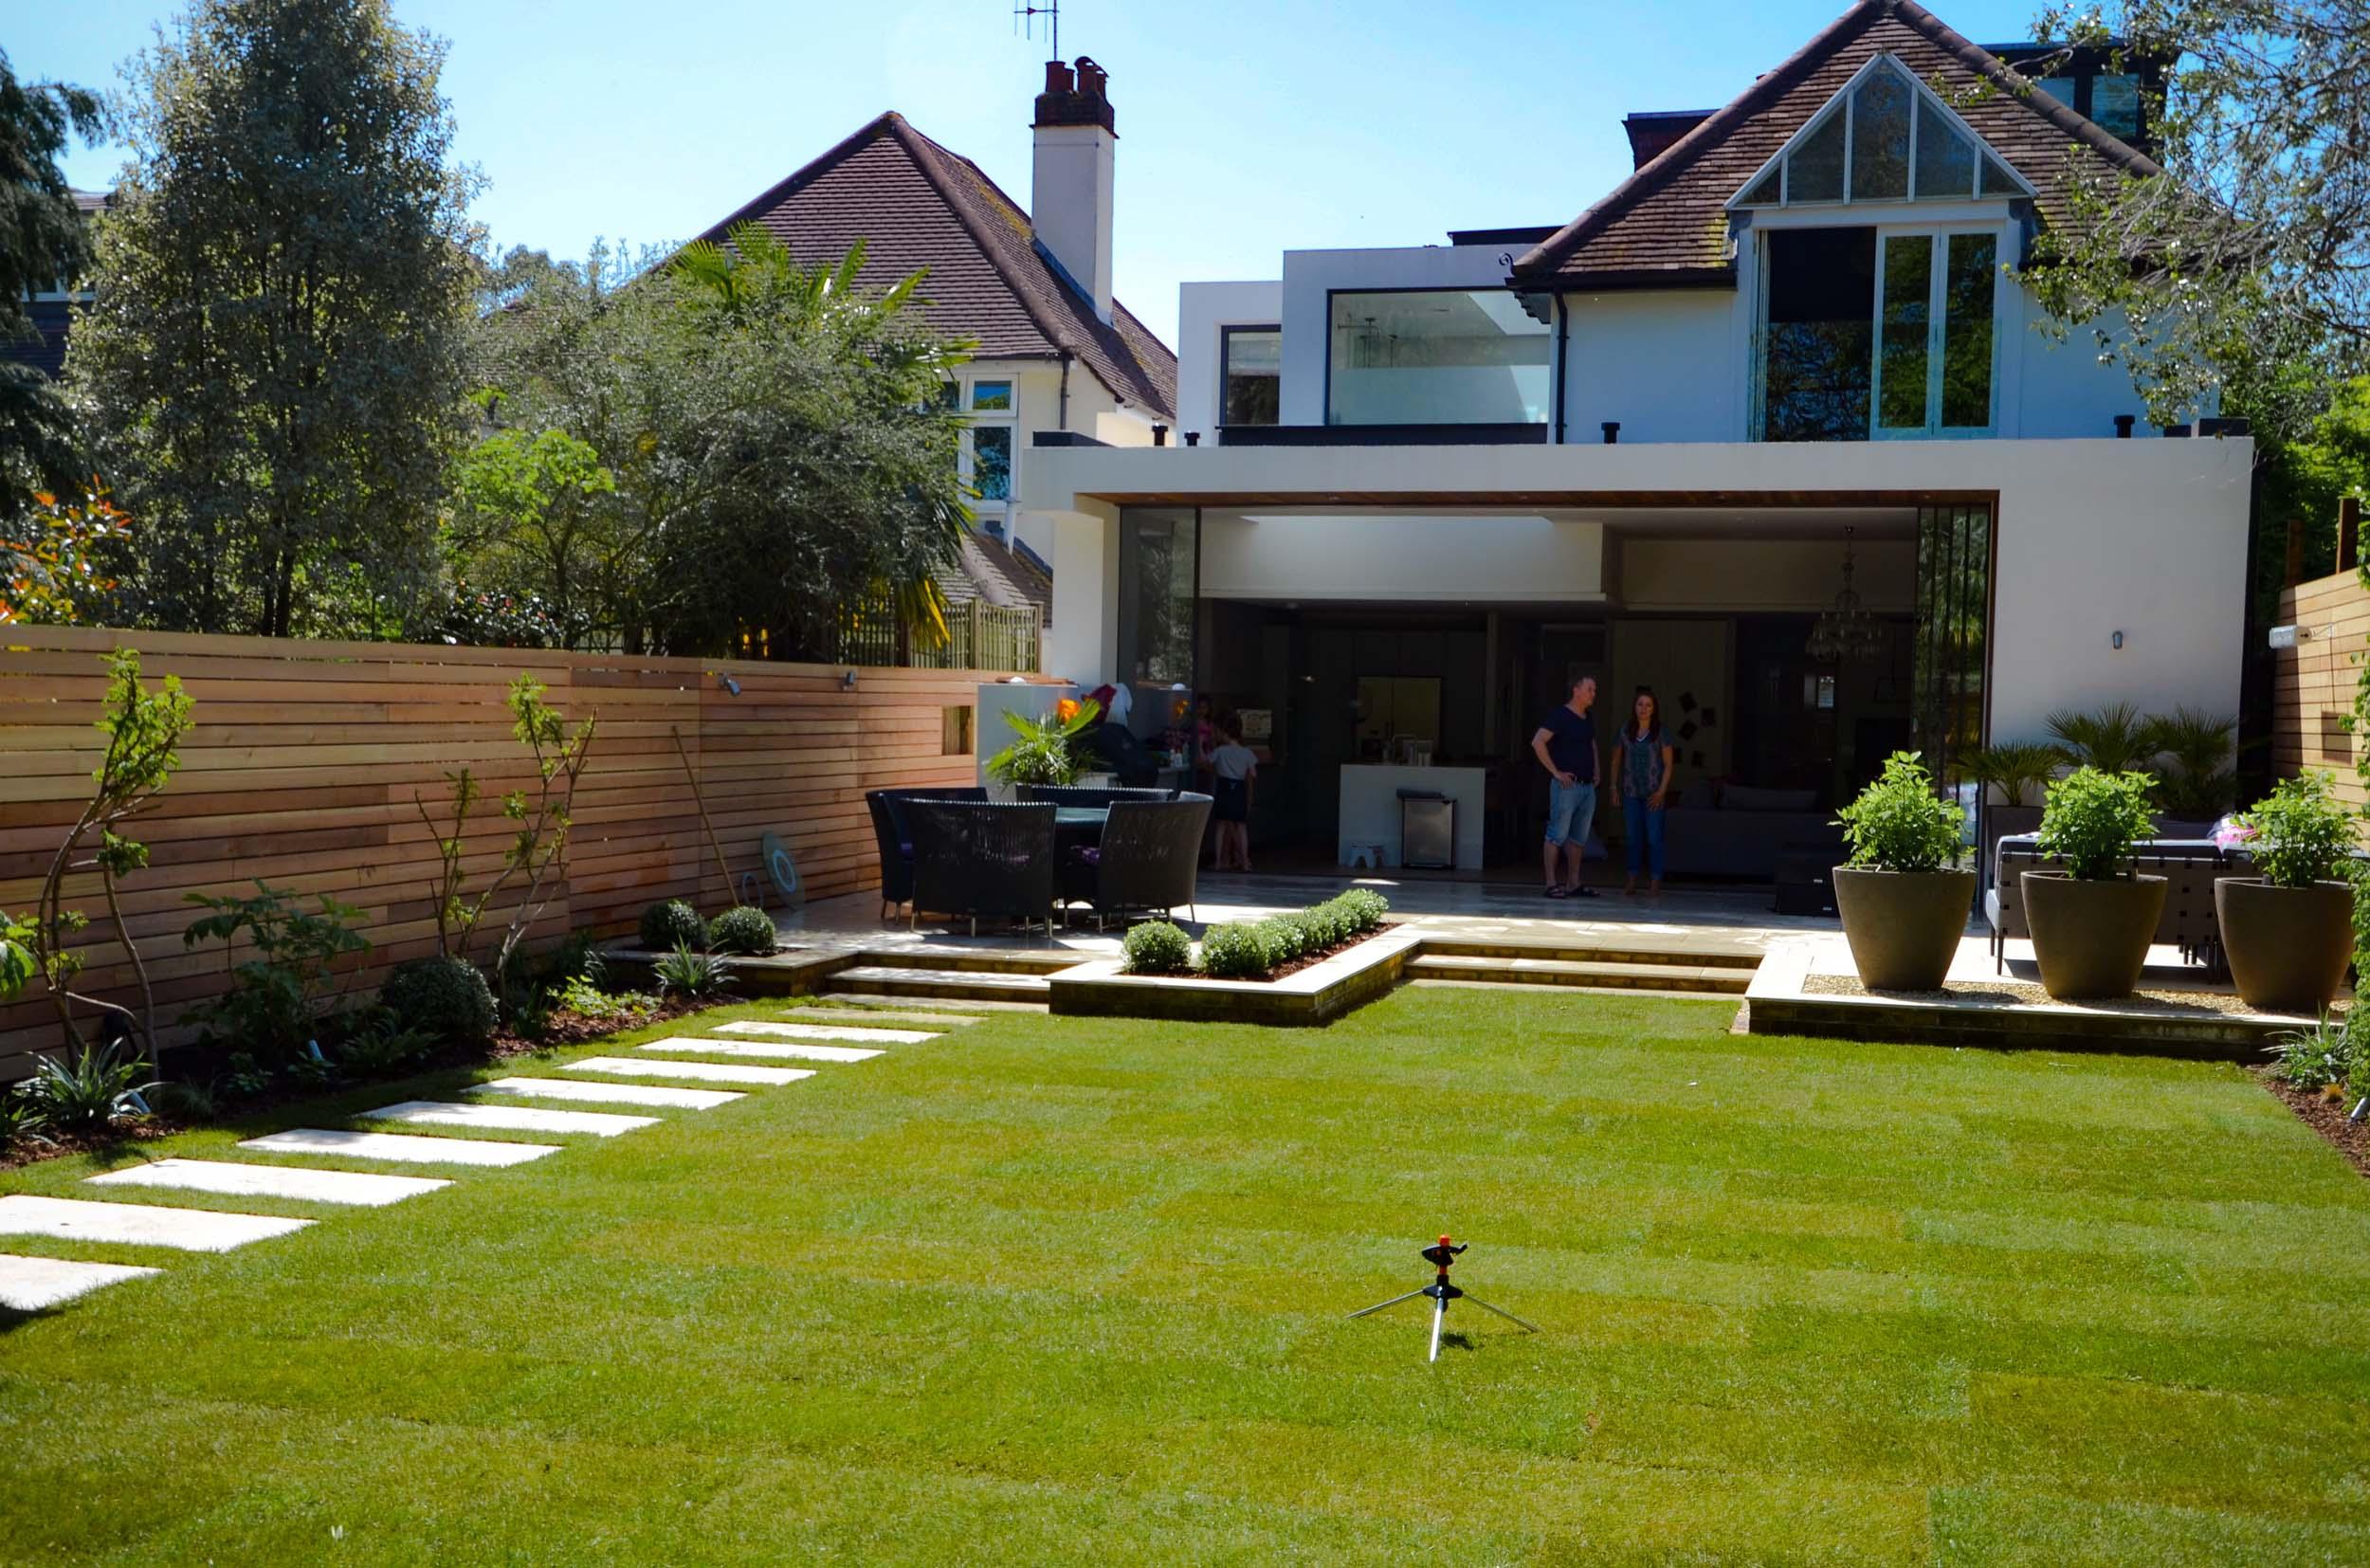 Azara-landscapes-chiswick-family-garden-1.jpg